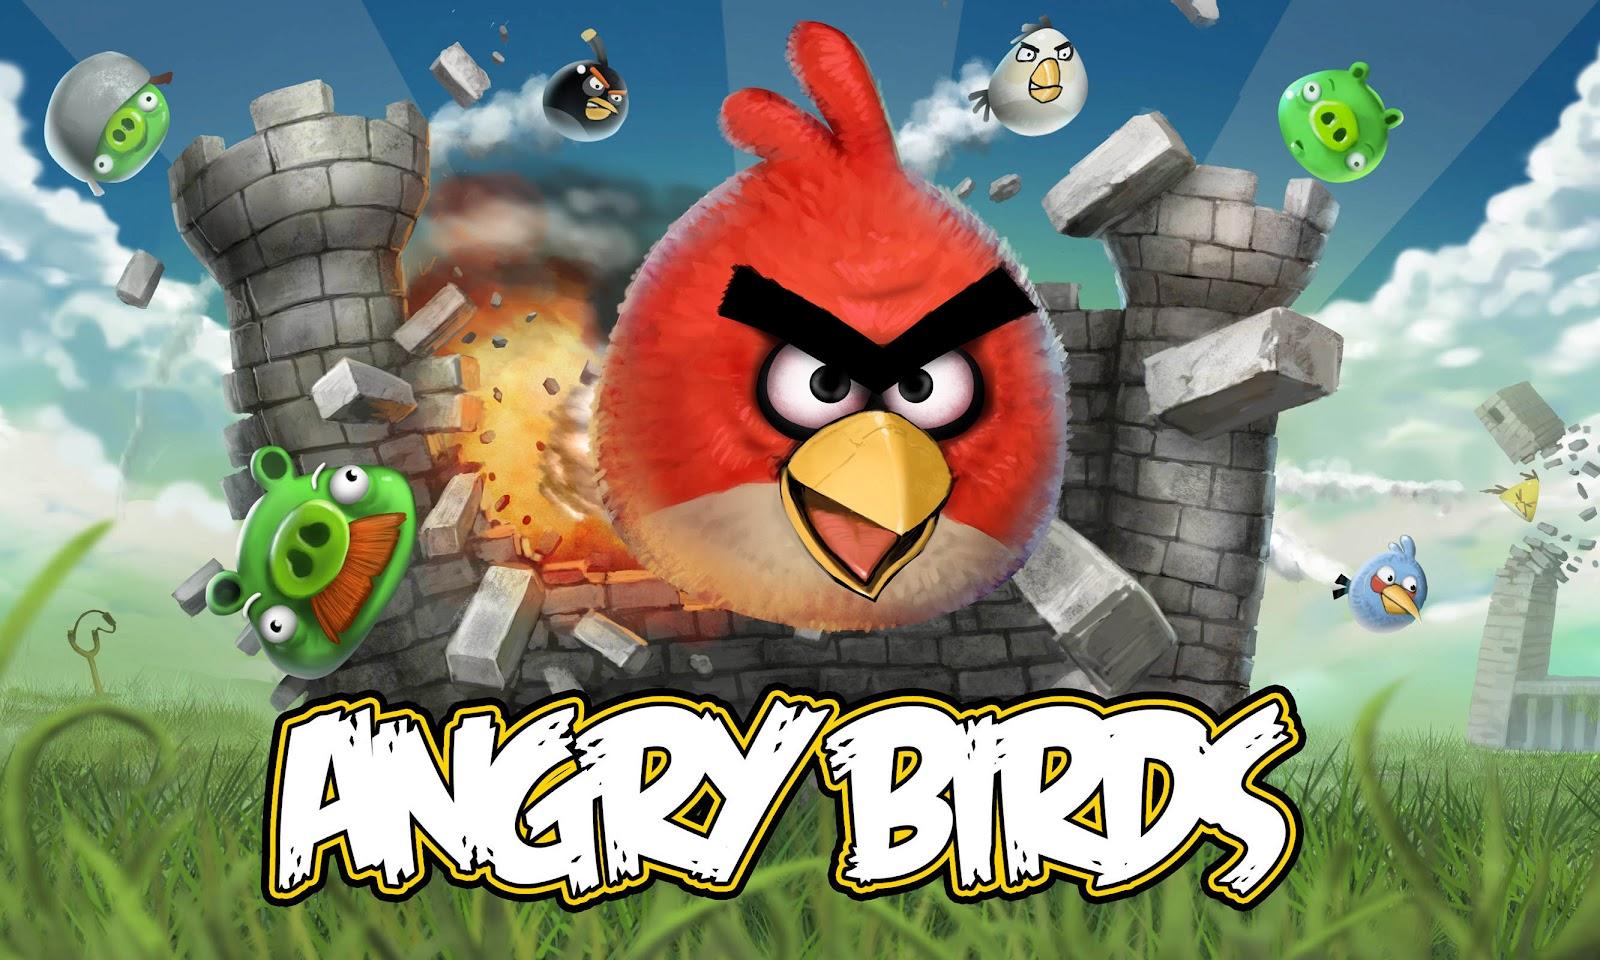 http://1.bp.blogspot.com/-N7hfRCyF4Yo/T18K2WQ4seI/AAAAAAAABSI/--cqyZY6h0g/s1600/angry-birds-exploding-castle-wallpaper.jpg